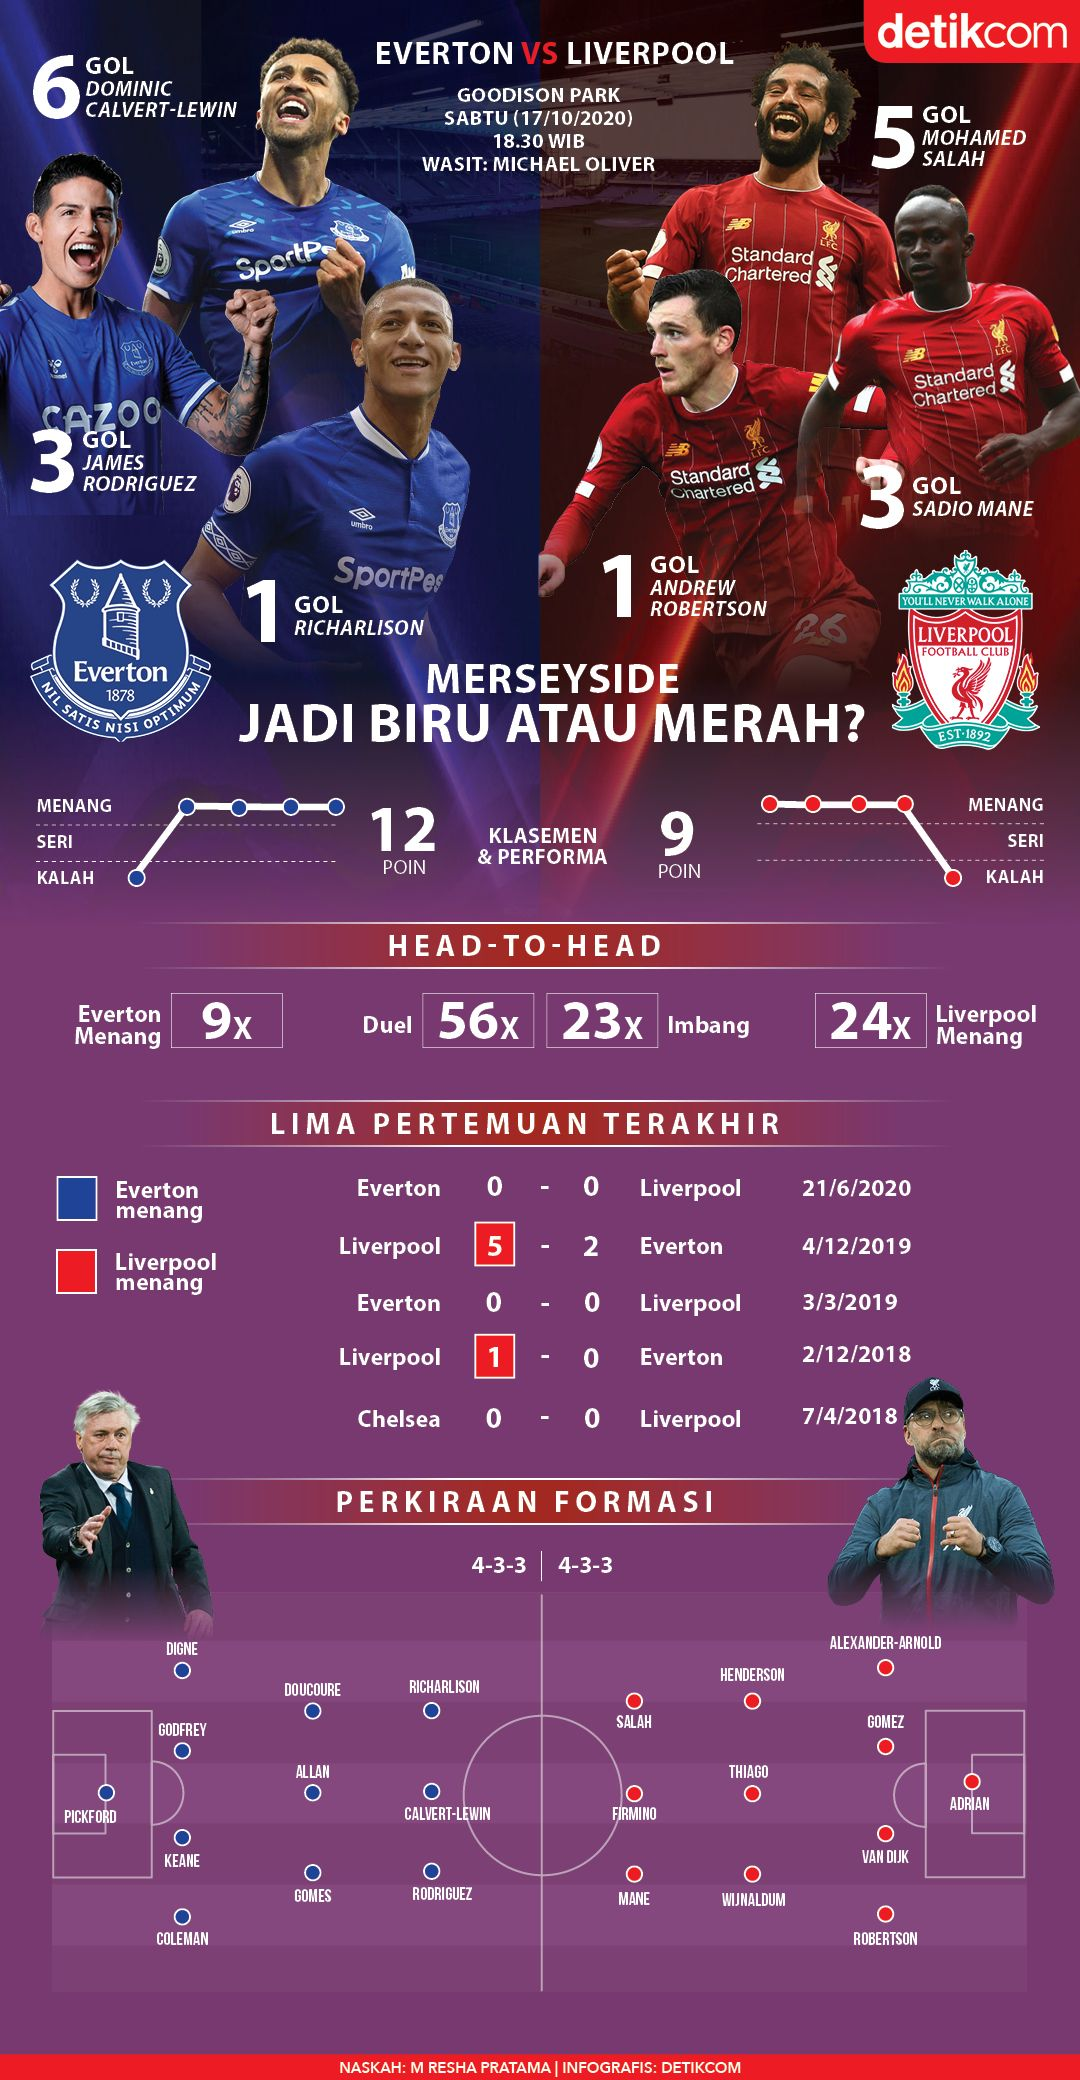 Infografis Everton vs Liverpool